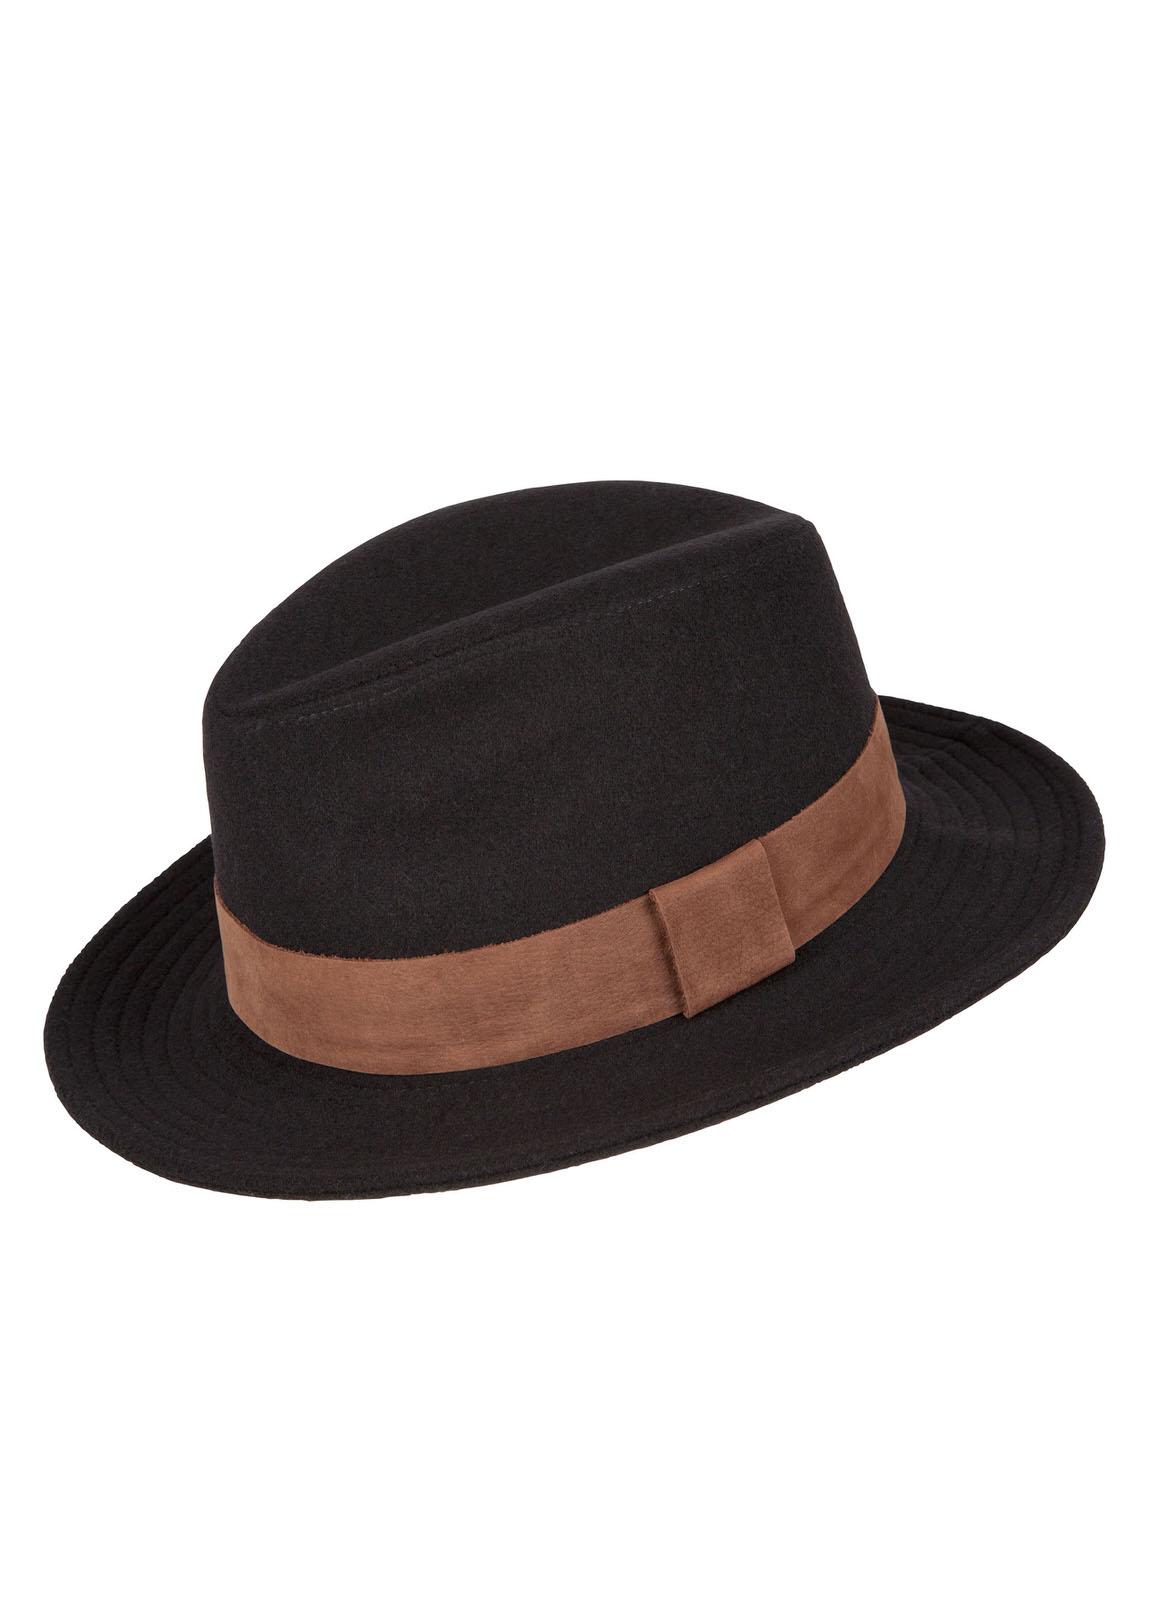 Rathowen Hat - Black